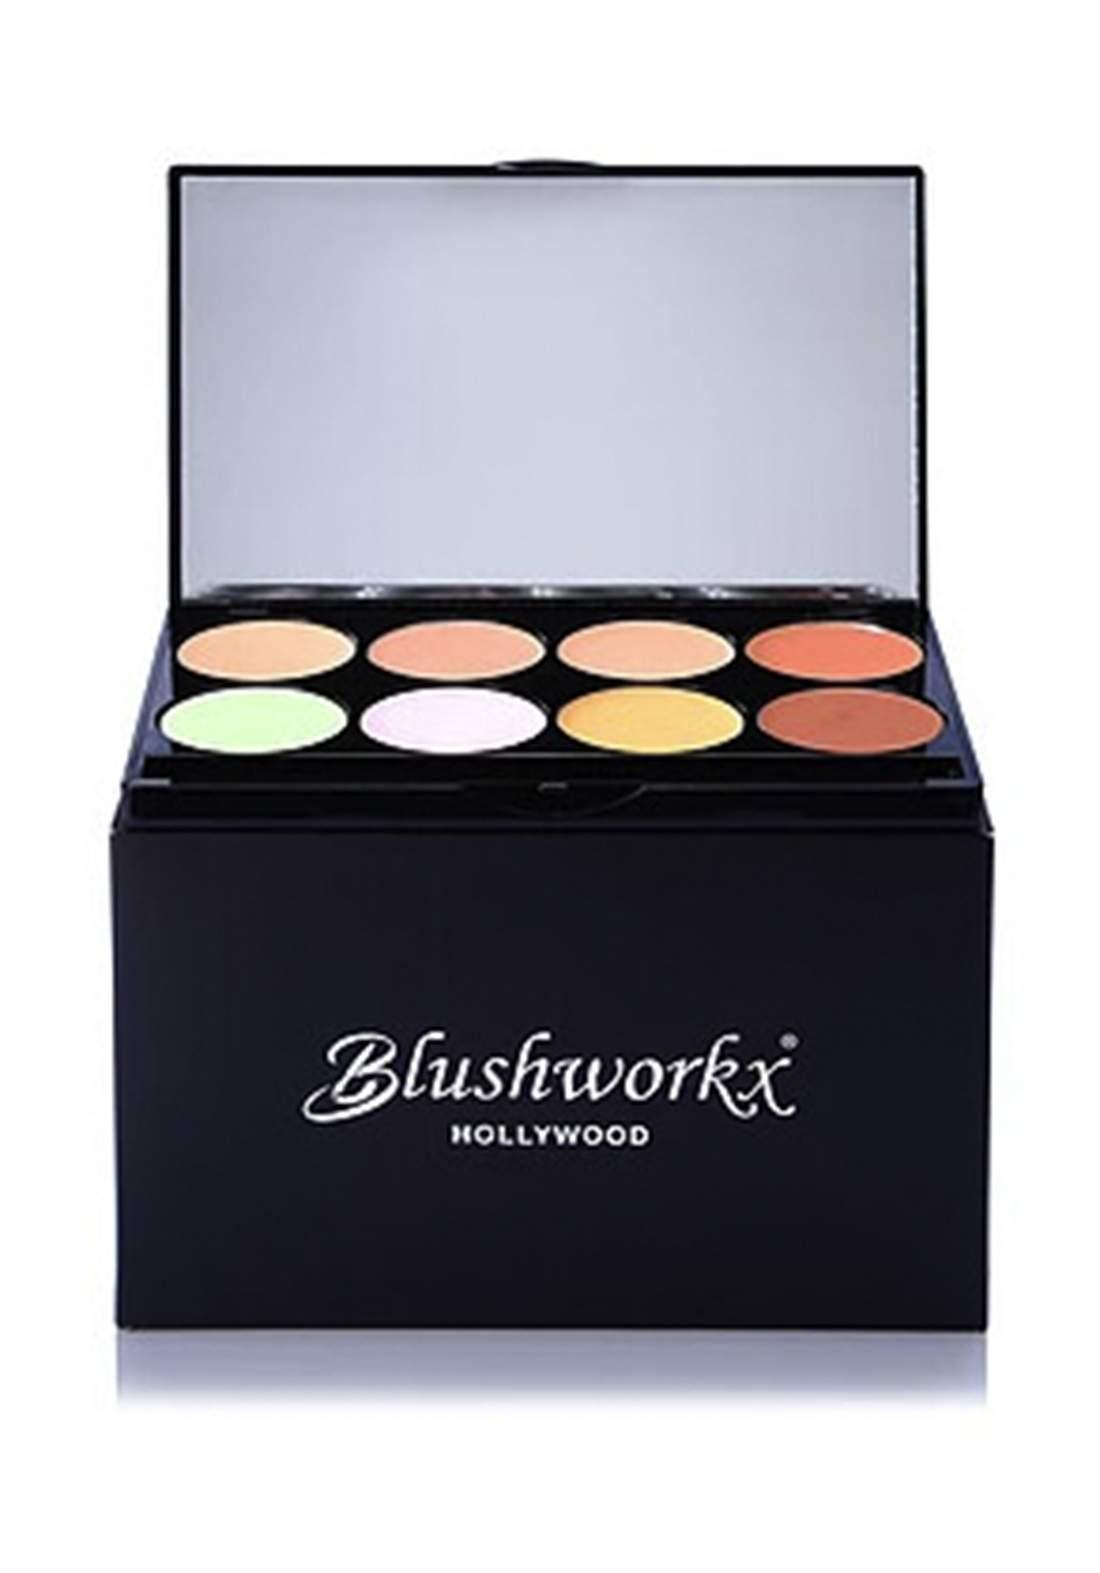 Blushworkx Hollywood Camouflage 8Pcs Kit باليت مصحح وخافي للعيوب